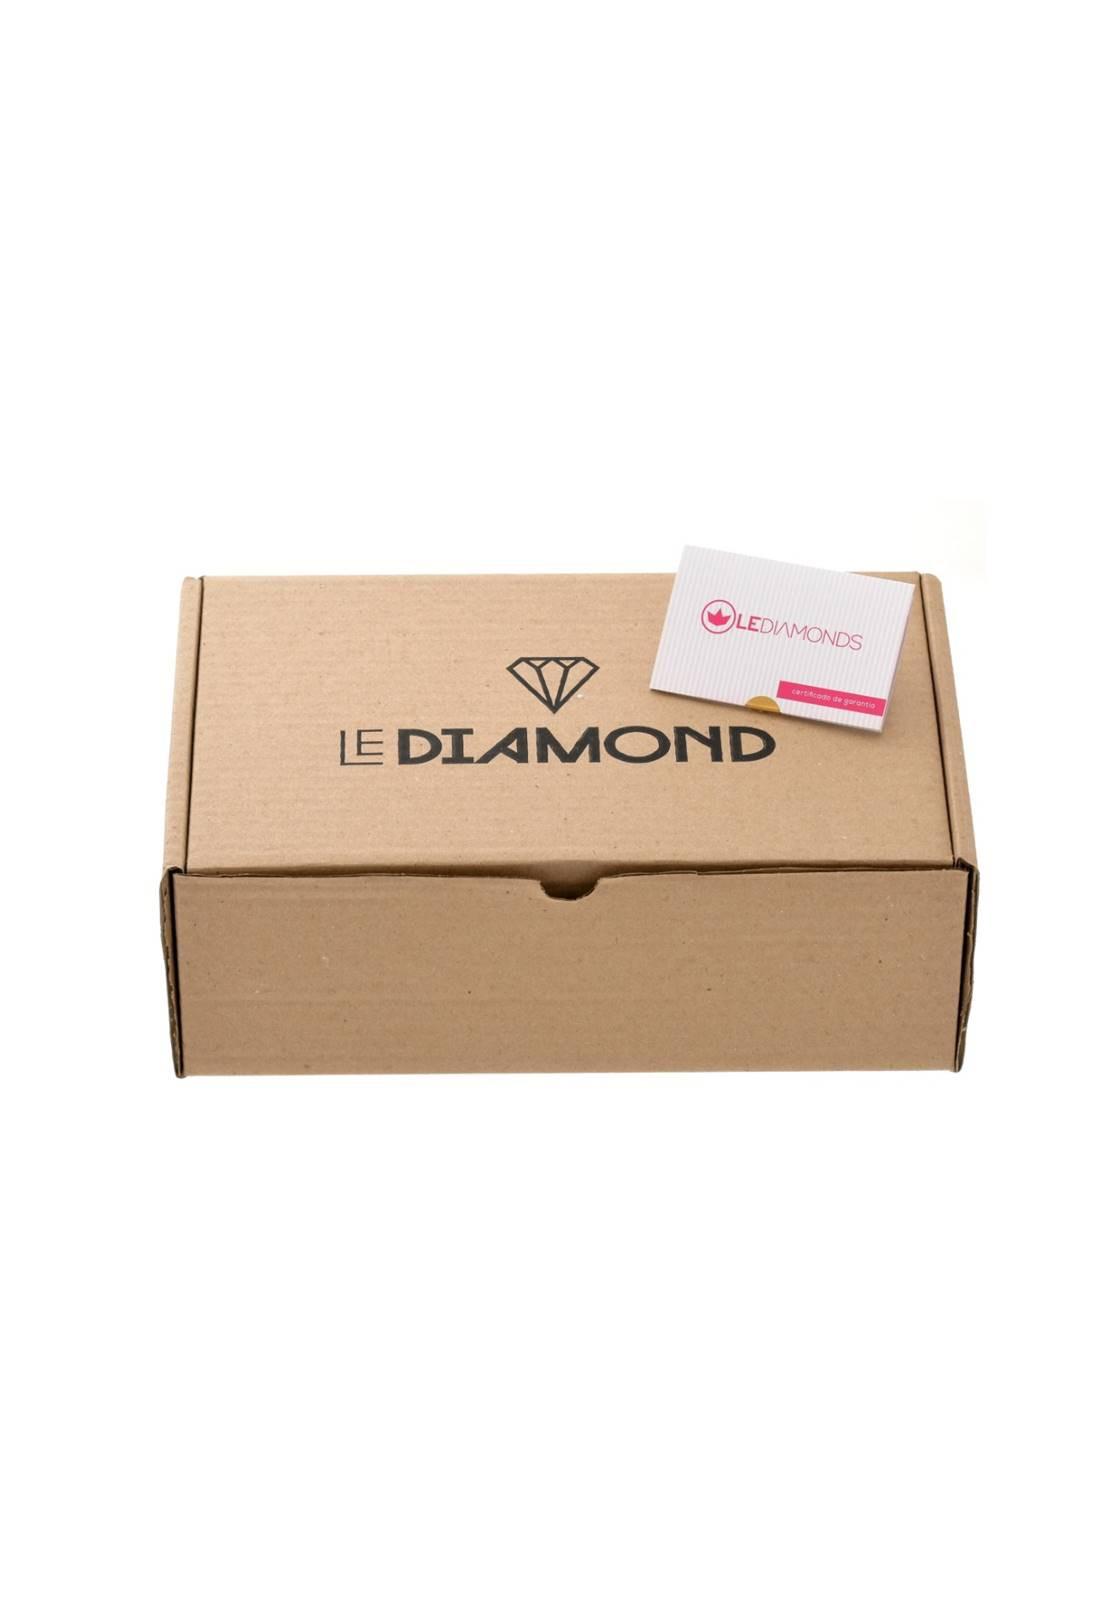 Brinco Le Diamond Argolinha c/ Pingente c/ 4 Perolas Colorida Roxo